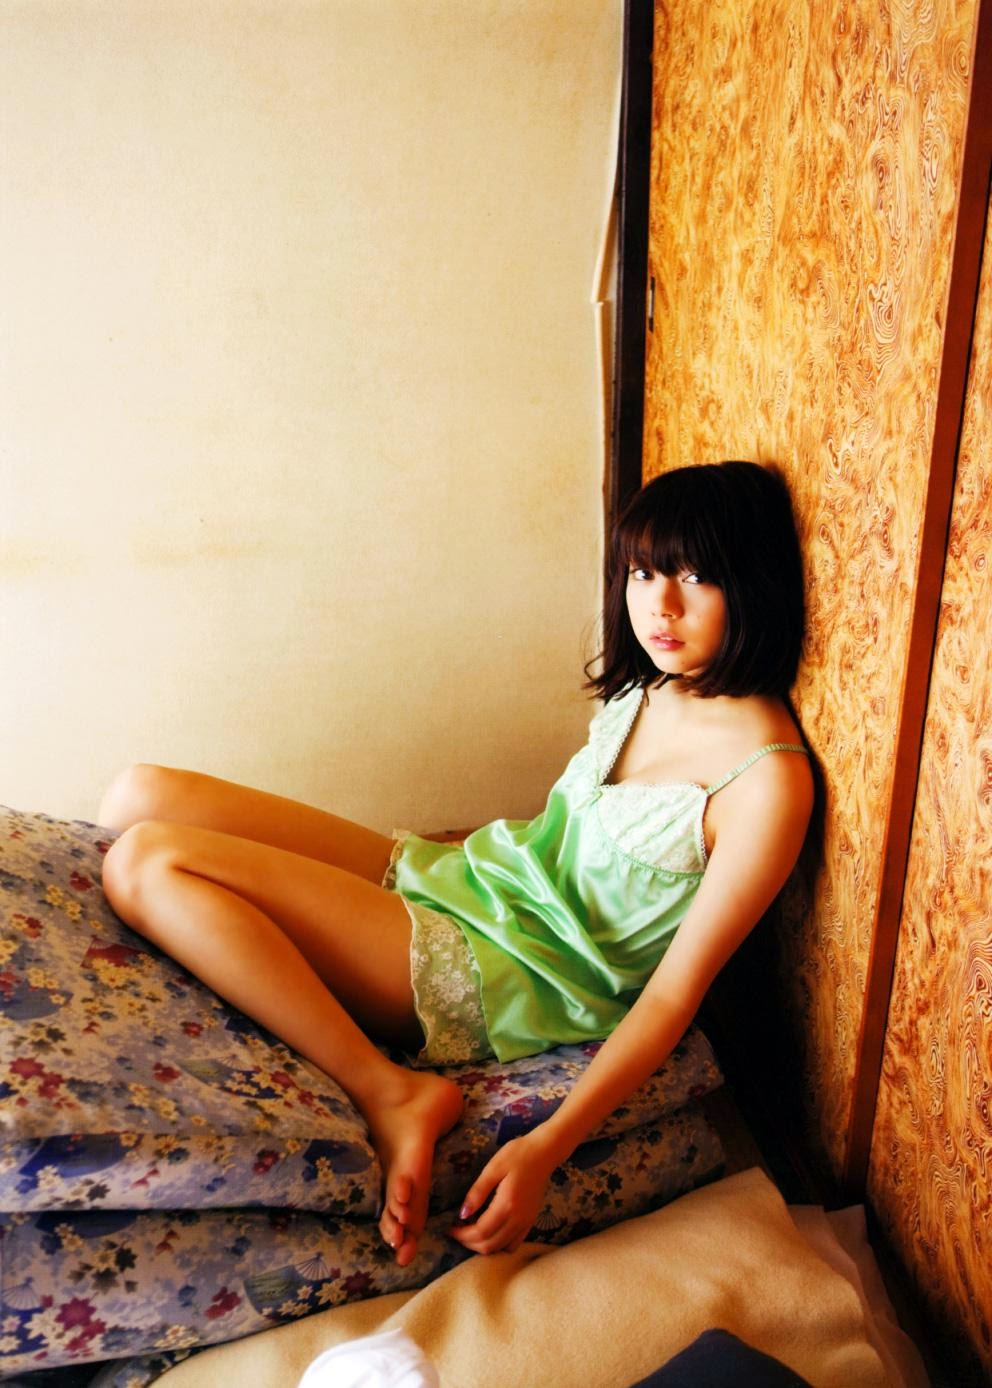 Nao Kanzaki and a few friends: Yuria Haga: 'Yuu Real ...